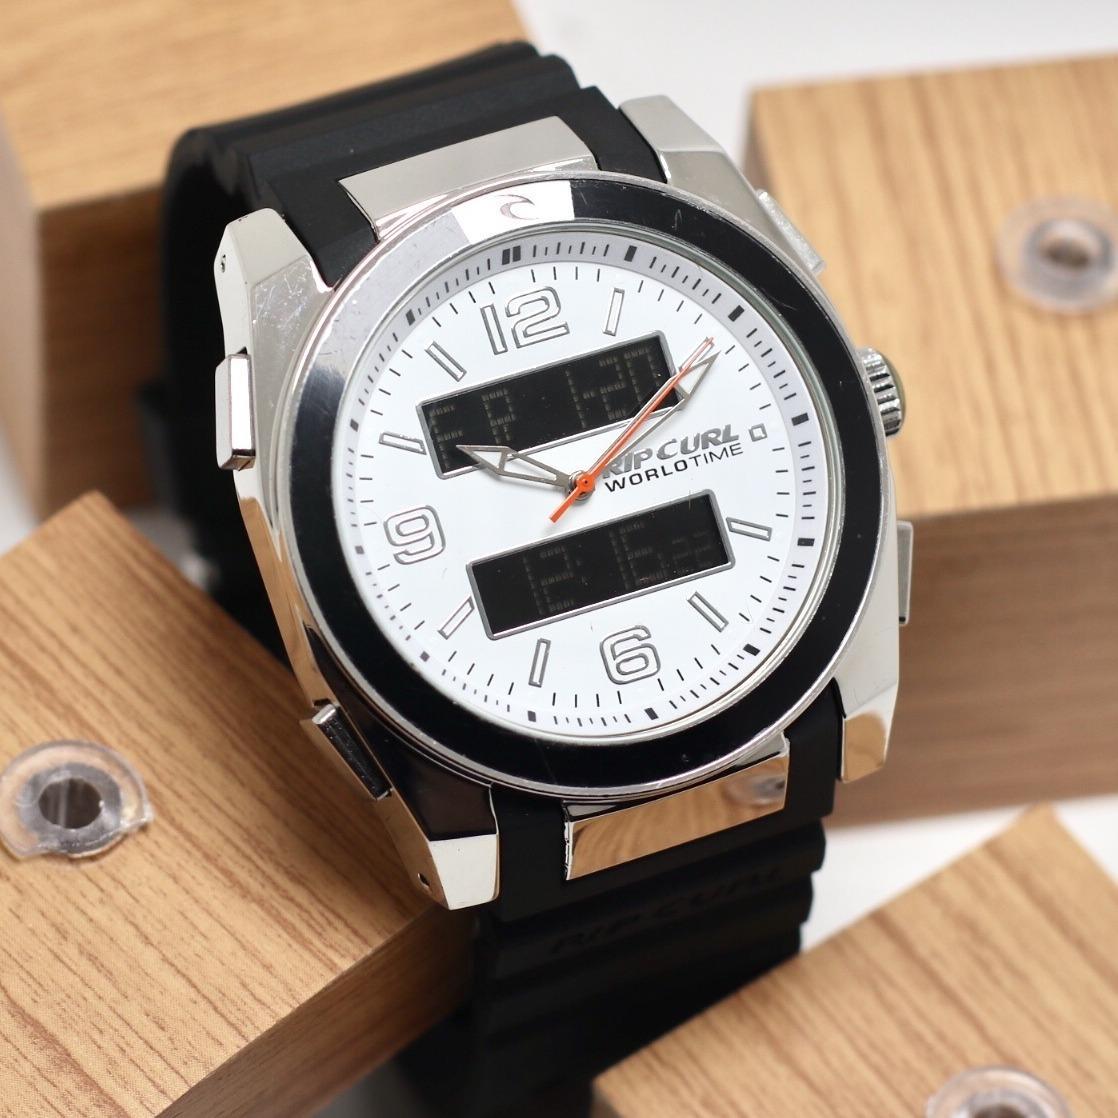 Jam tangan Pria Rubber strap ( Ripcurl ) Design Exclusif Leather Strap Dual Time